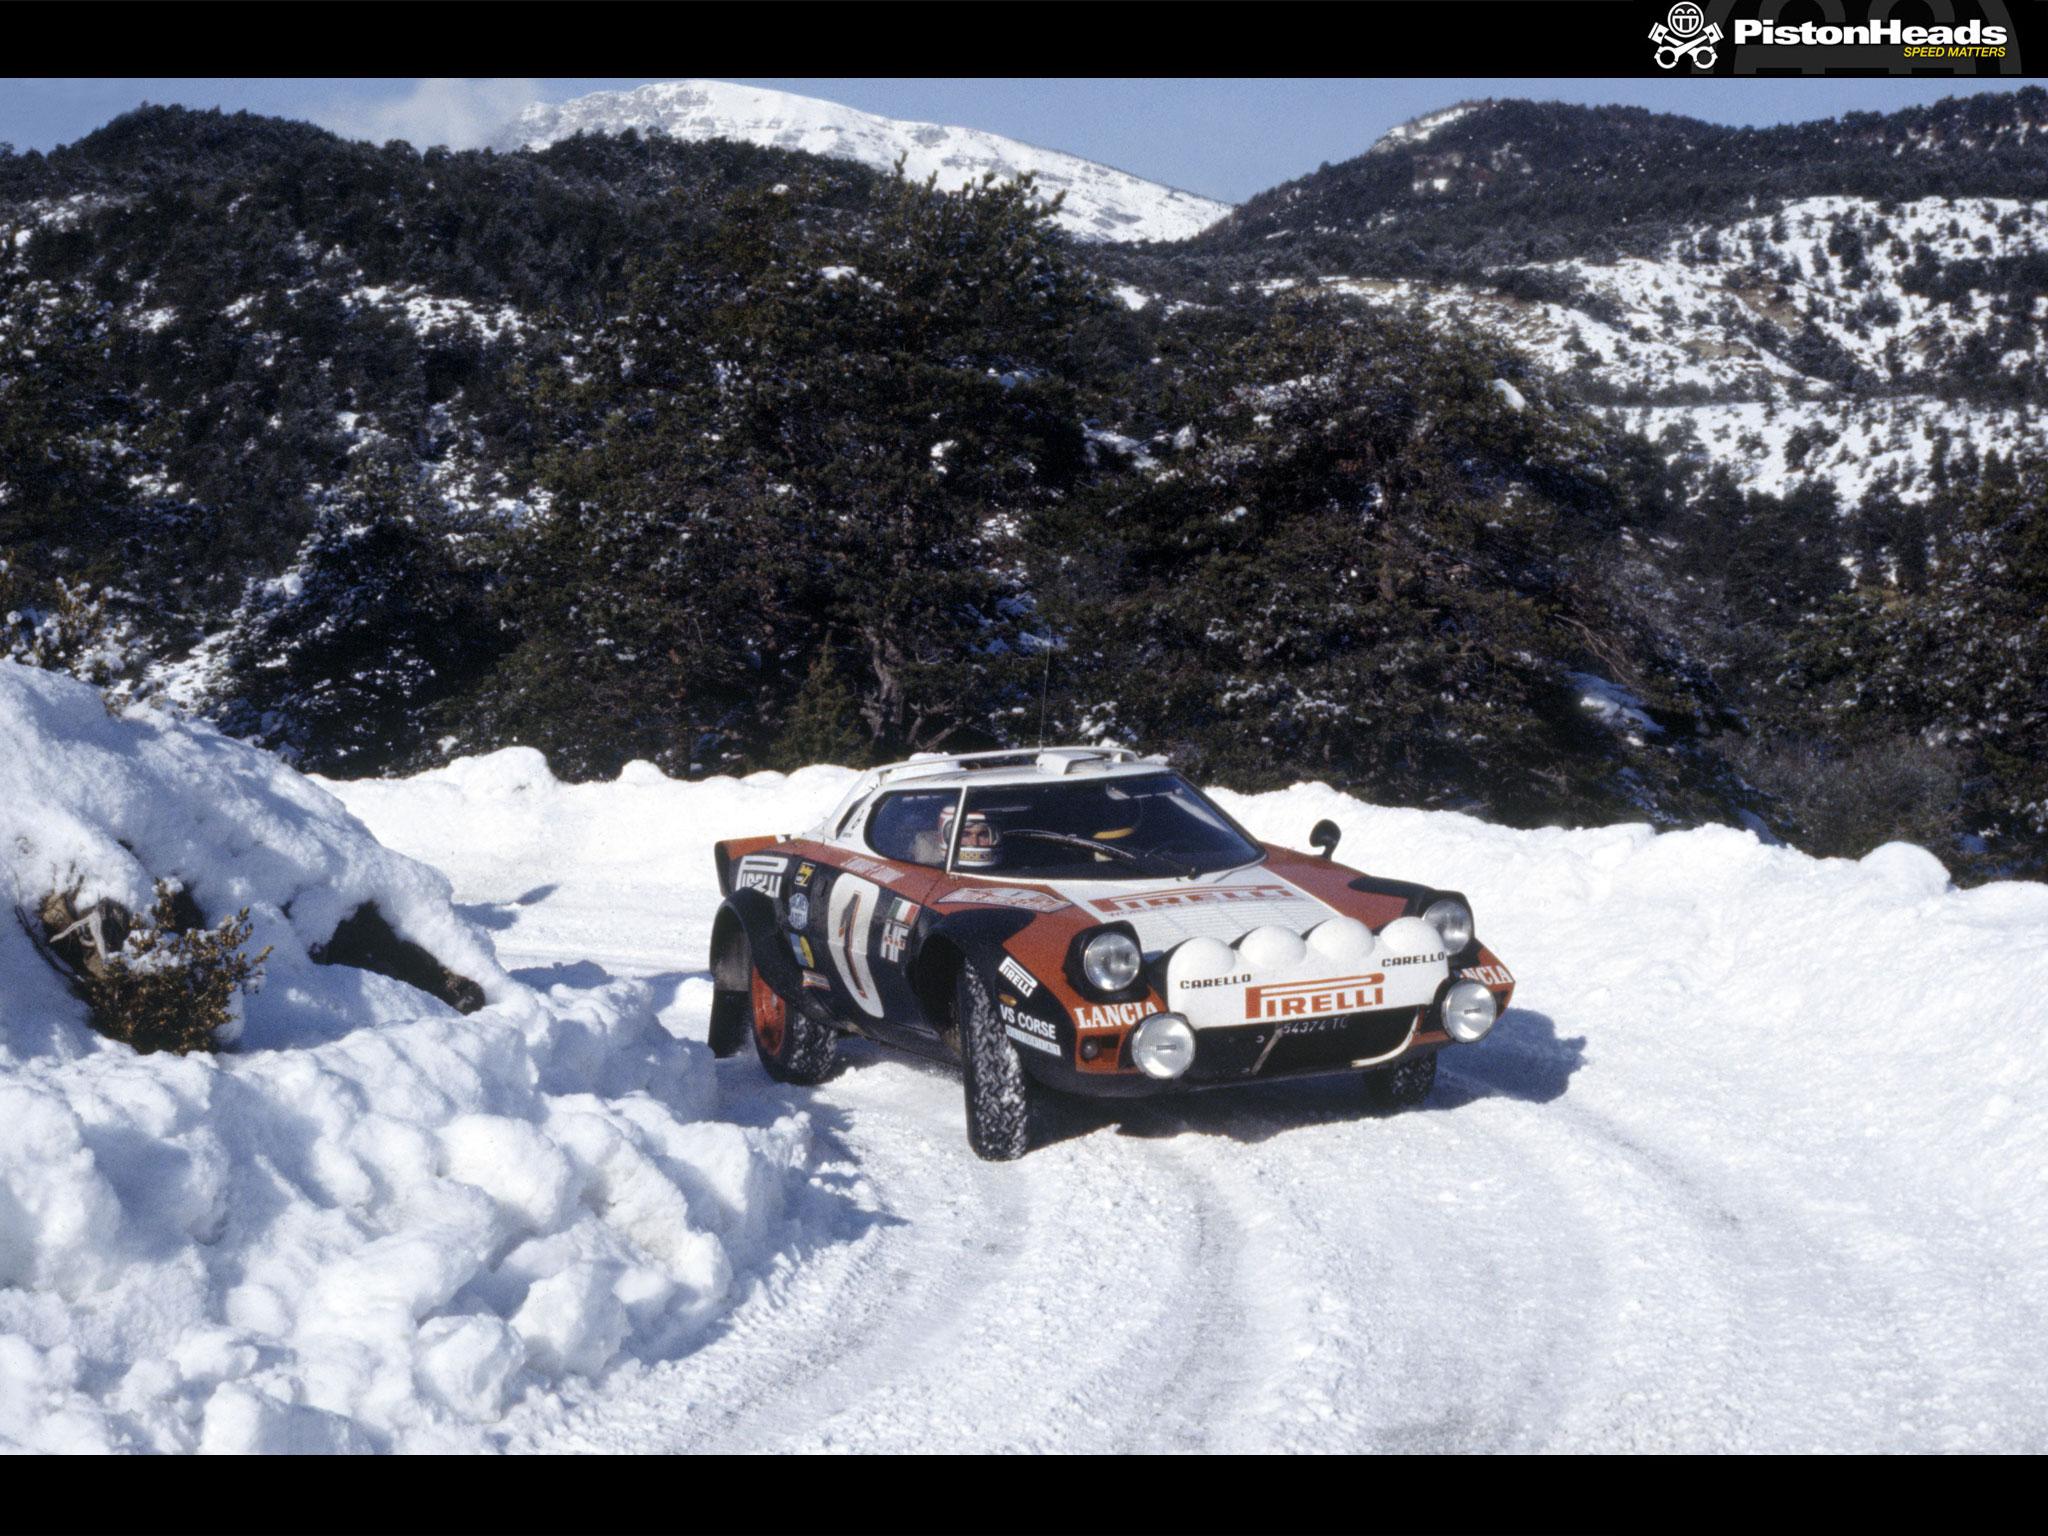 1970s Italian rally star